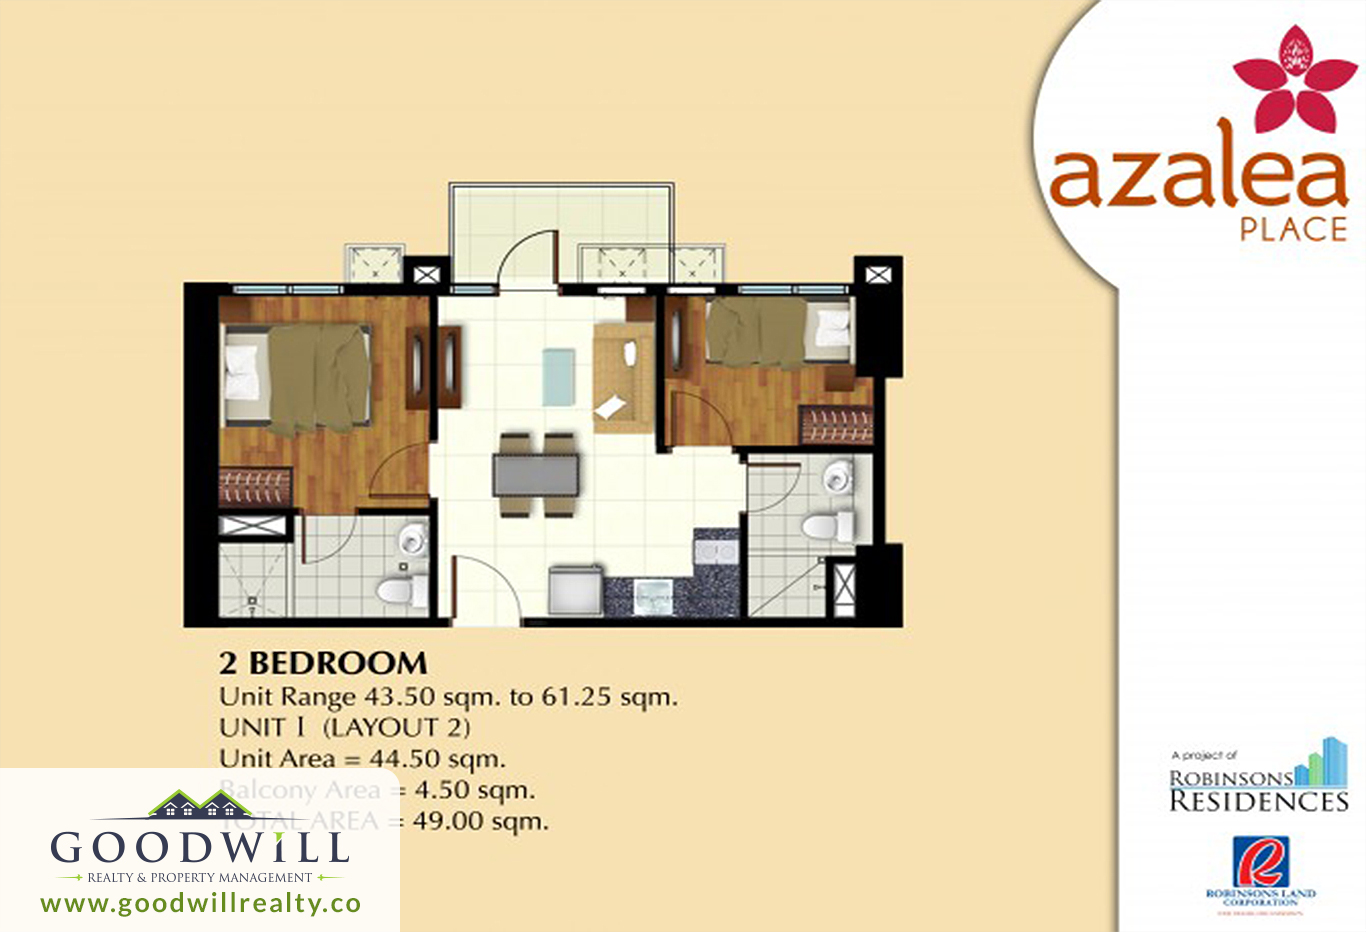 Alzea azalea studio - cebu city's most enviable addresses